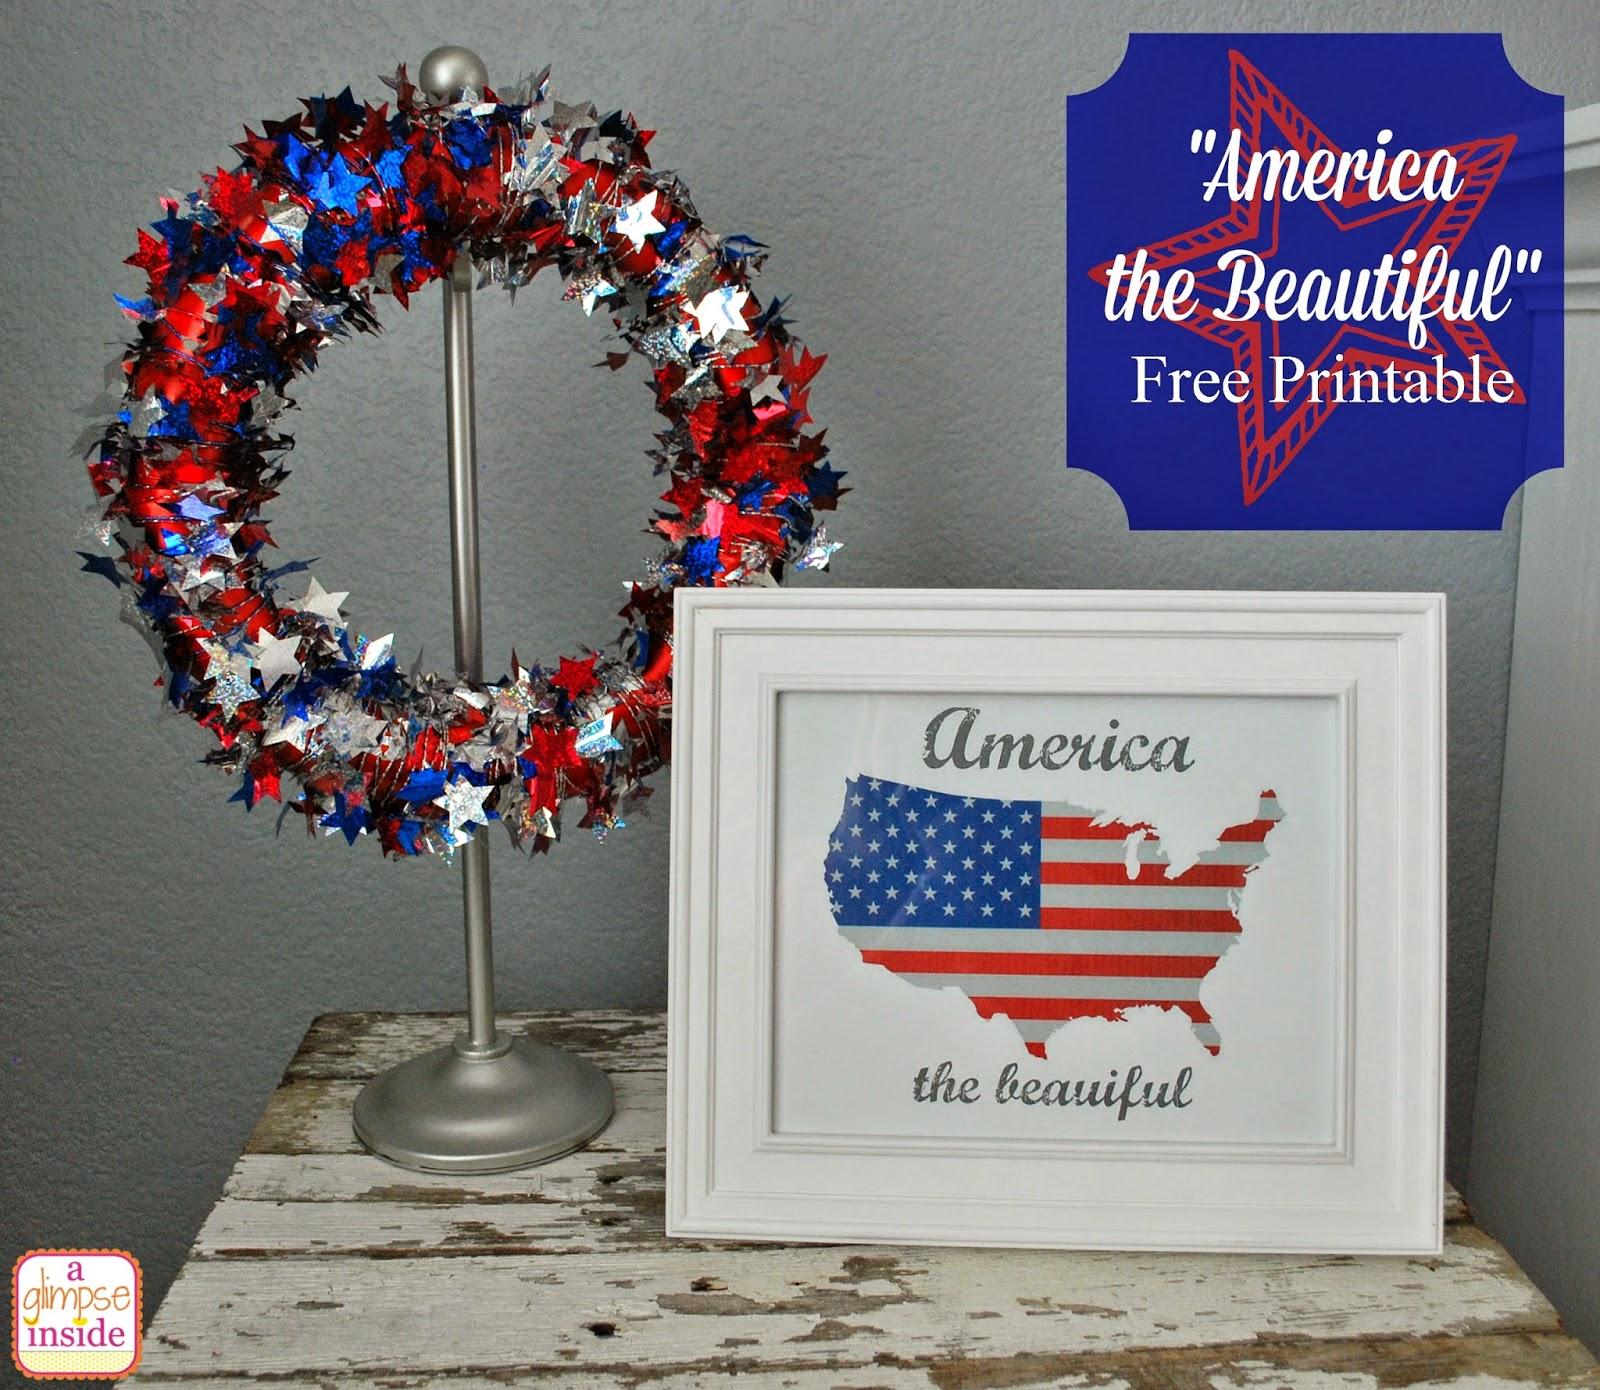 http://www.aglimpseinsideblog.com/2014/06/america-beautiful-printable.html